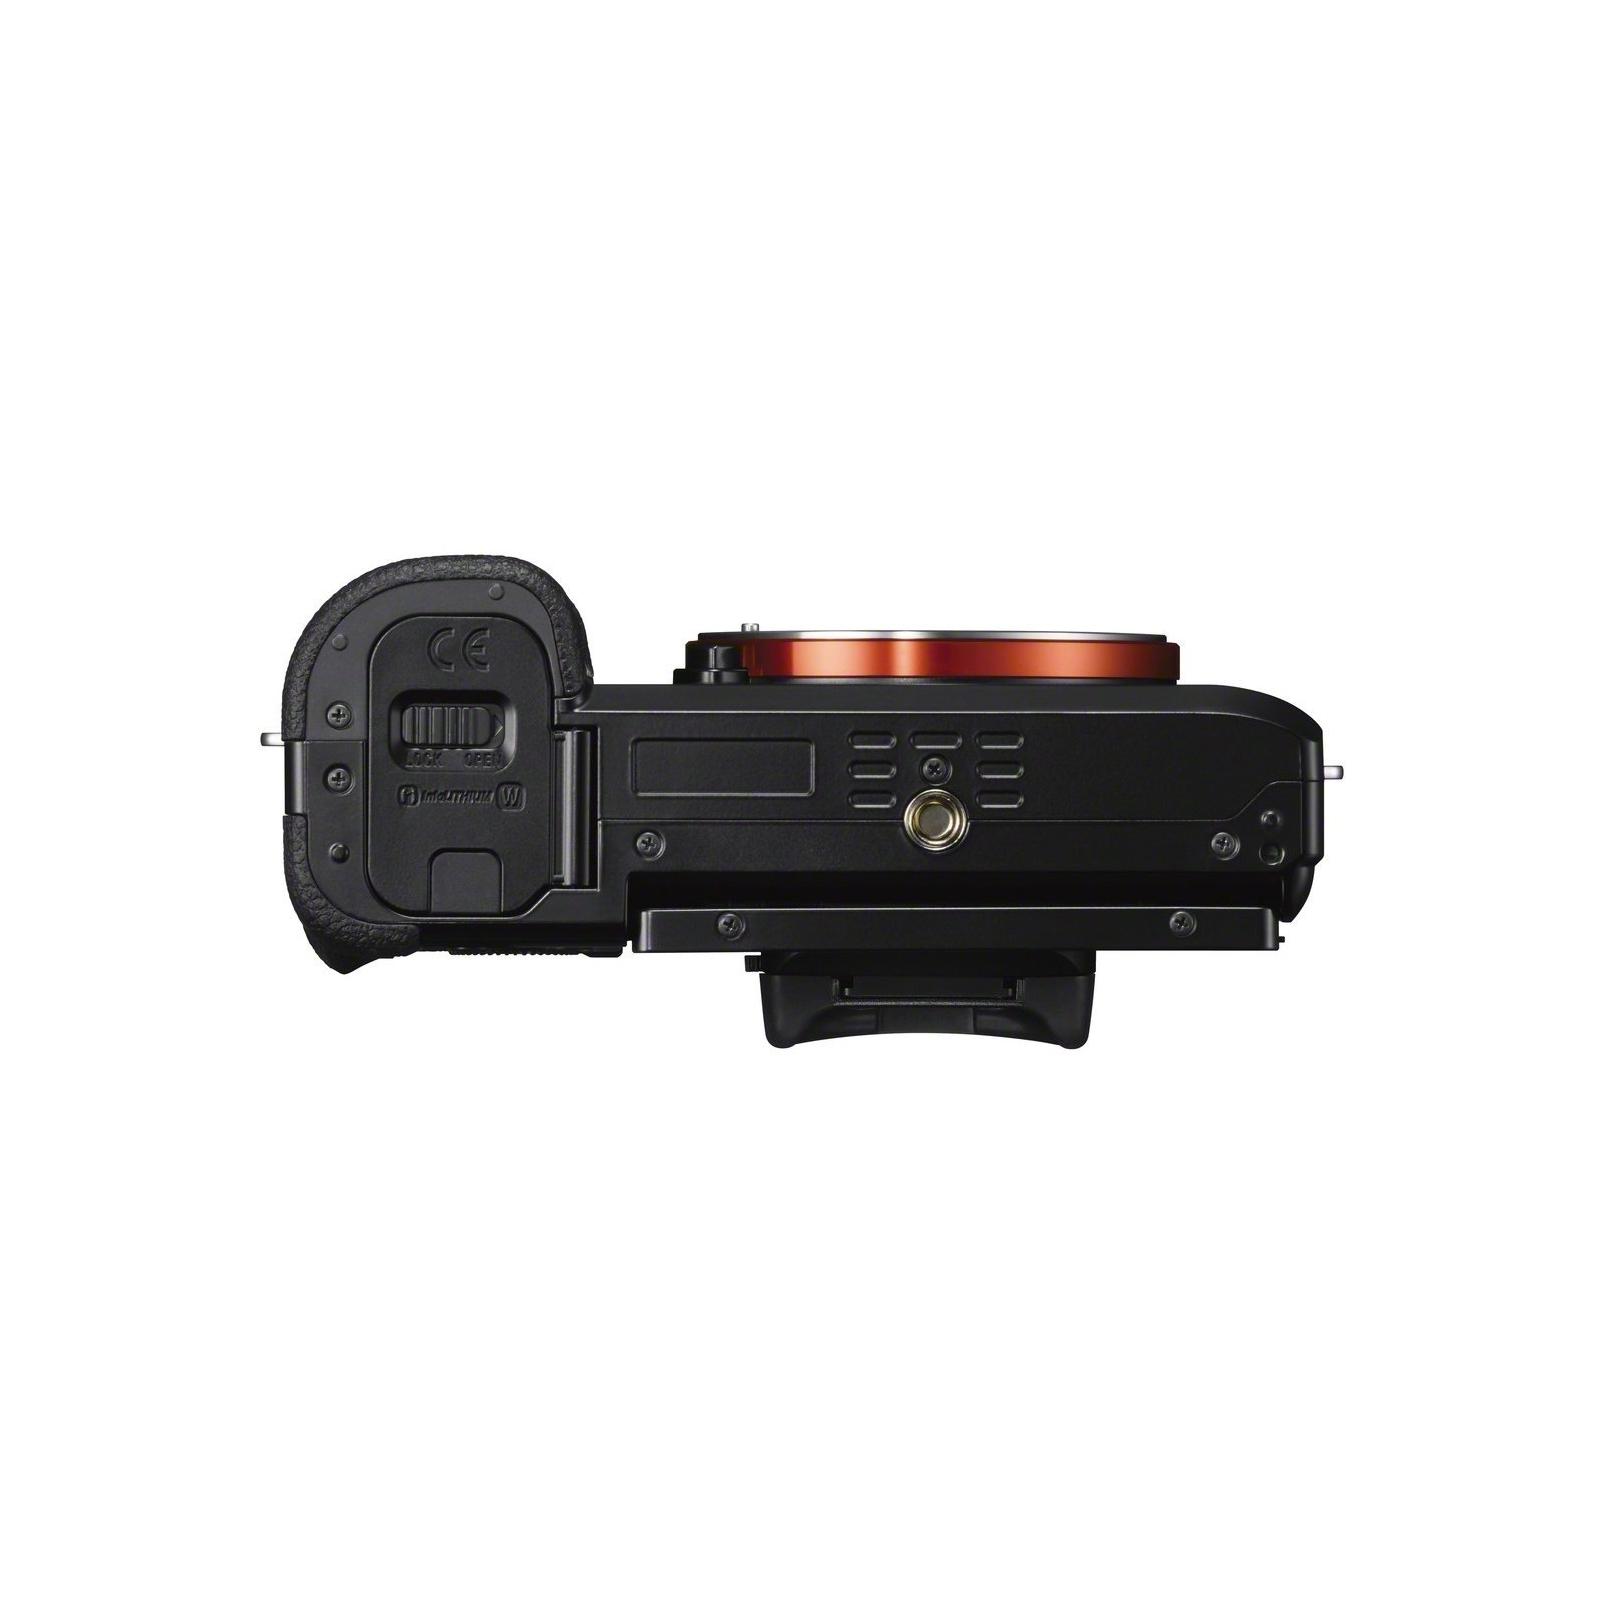 Цифровой фотоаппарат SONY Alpha 7 28-70 kit black (ILCE7KB.RU2) изображение 10